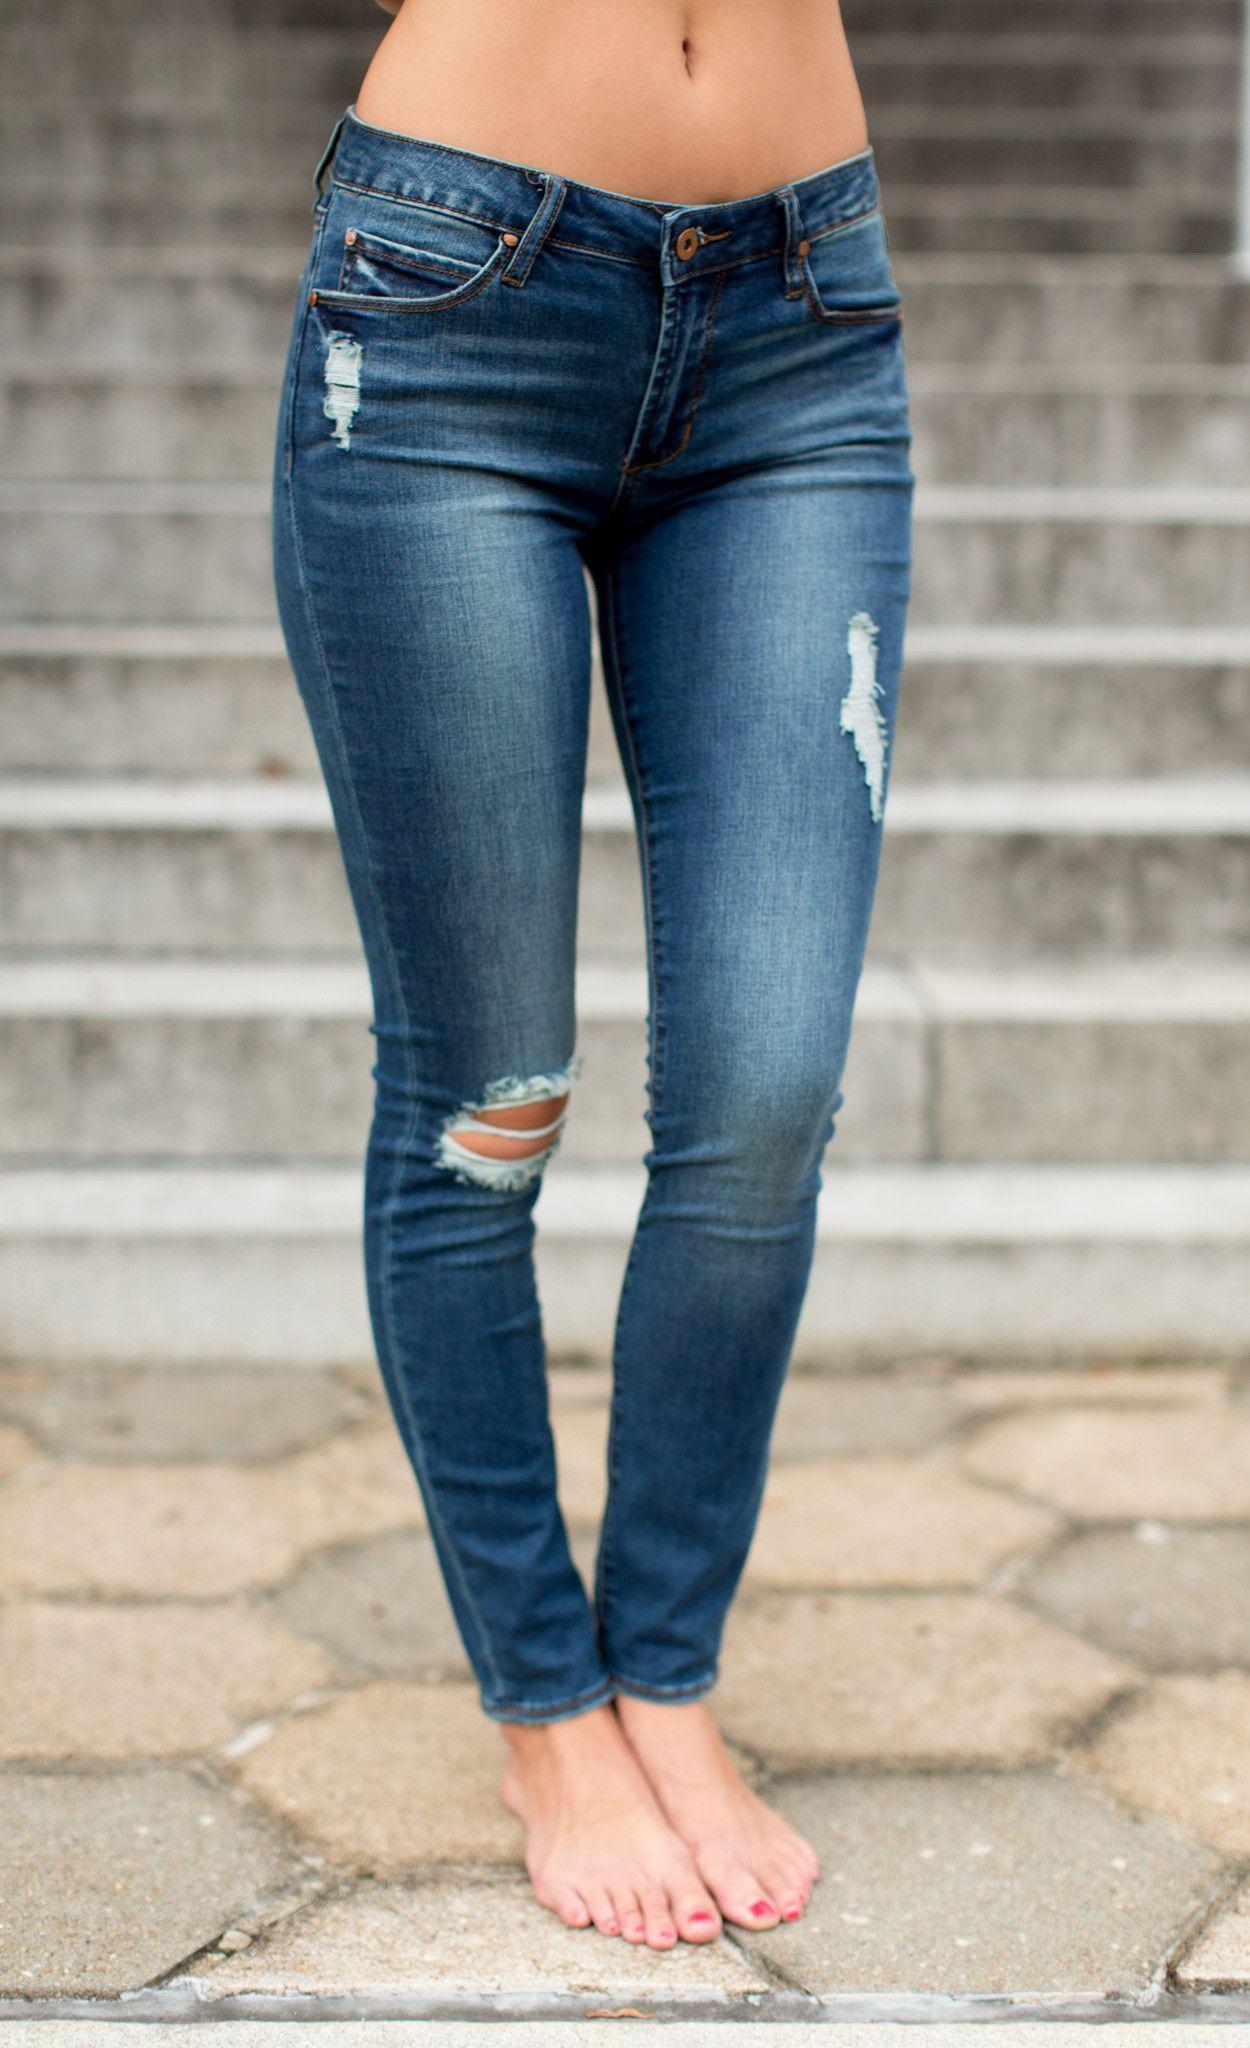 e7facf1c1381 Articles of Society Sarah Skinny Jeans - Hollywood. Got them yesterday at  SOHO! thanks guys!